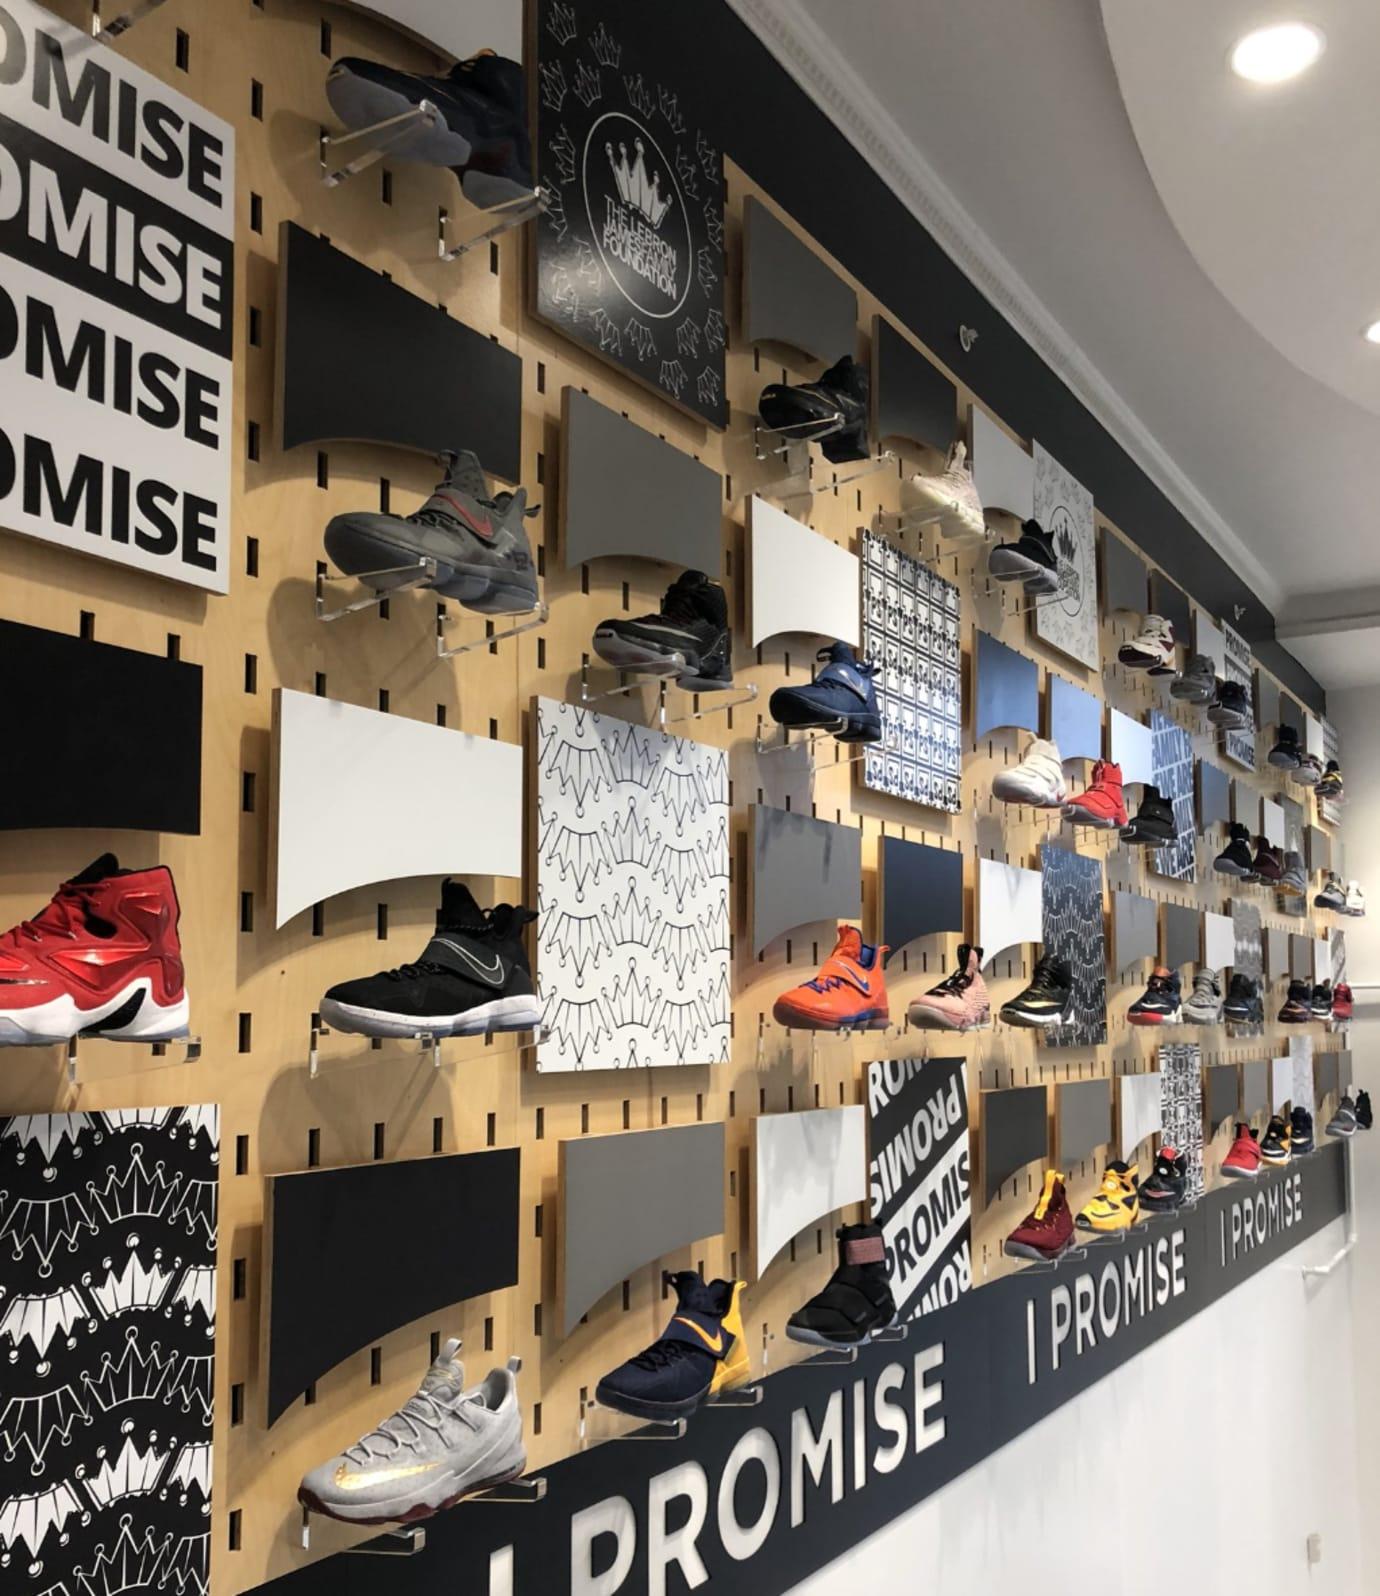 LeBron James game-worn sneaker wall I Promise school 1